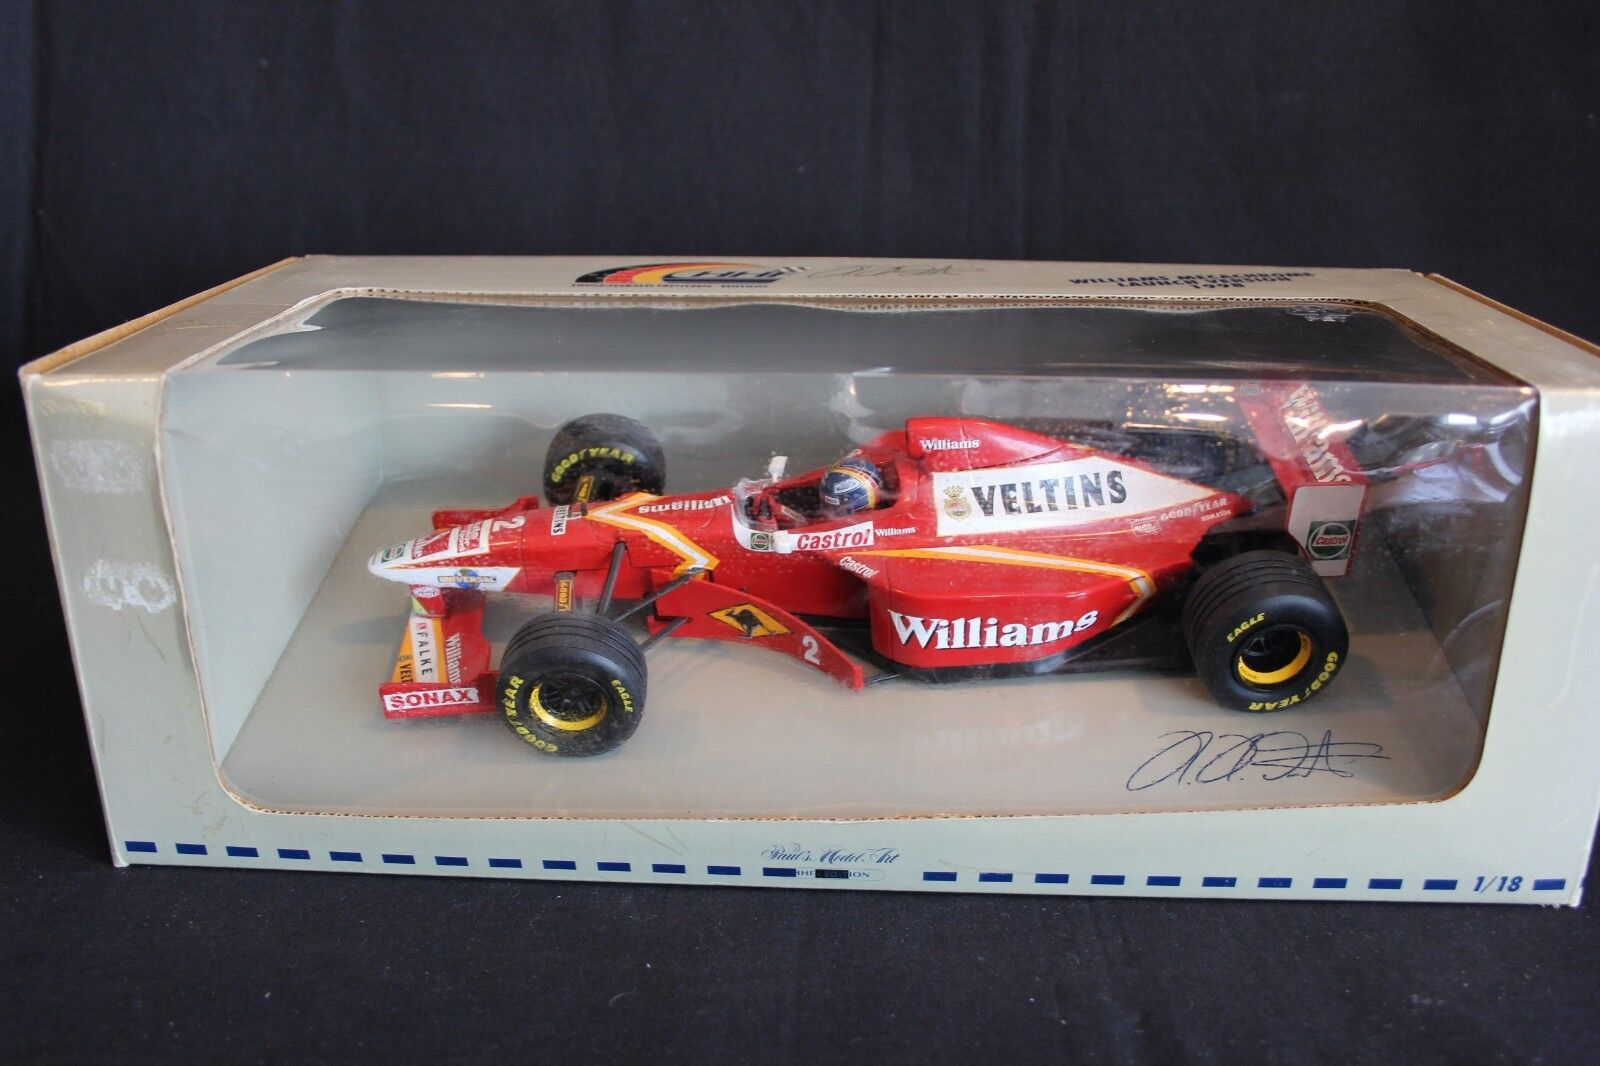 Minichamps Williams Mecachrome Launch car 1998 1 1 1 18 Heinz-Harald Frentzen 4408c8